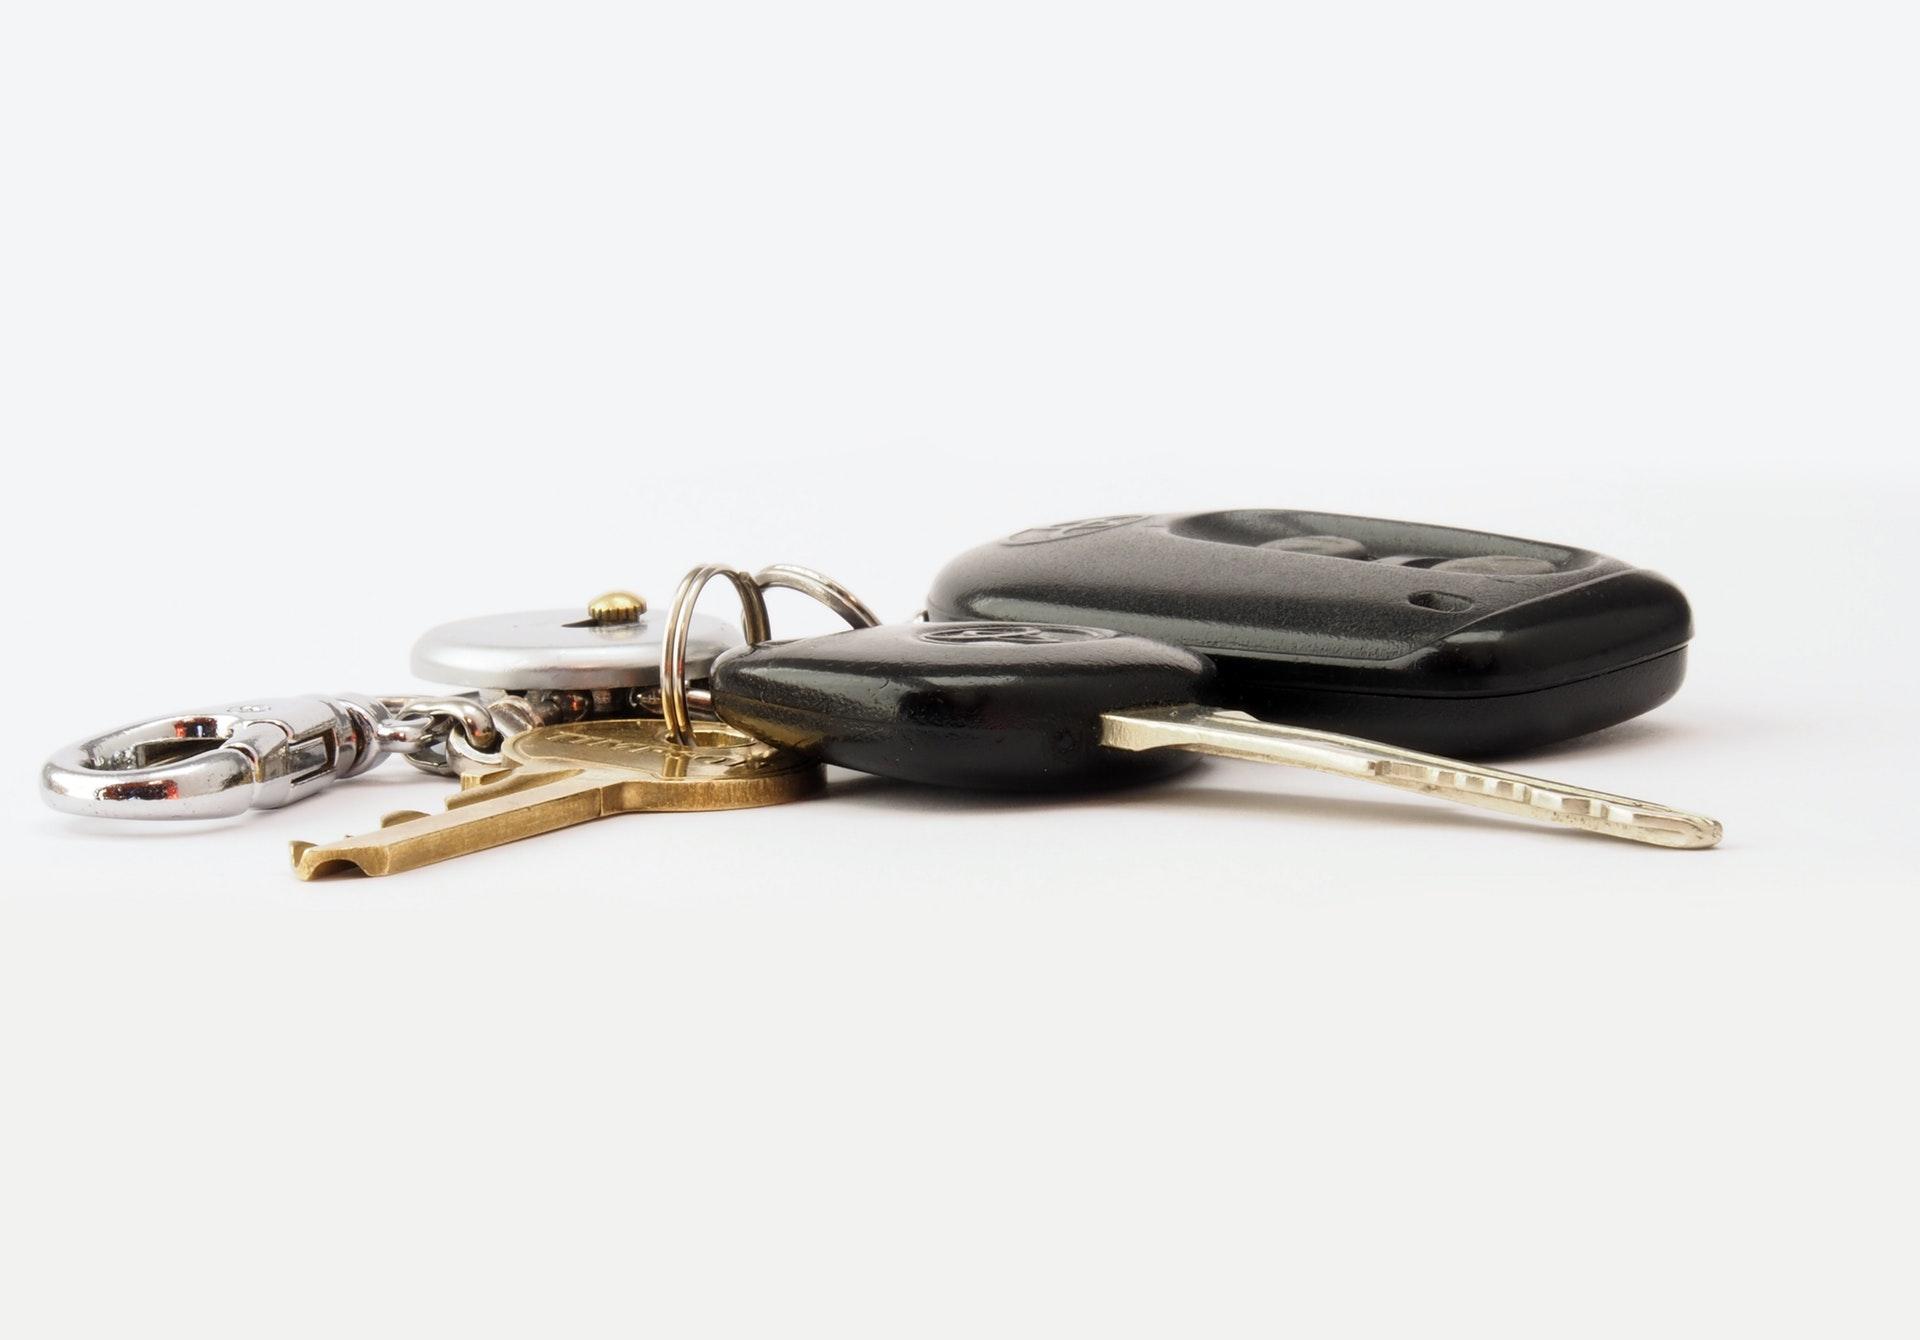 car keys on white background